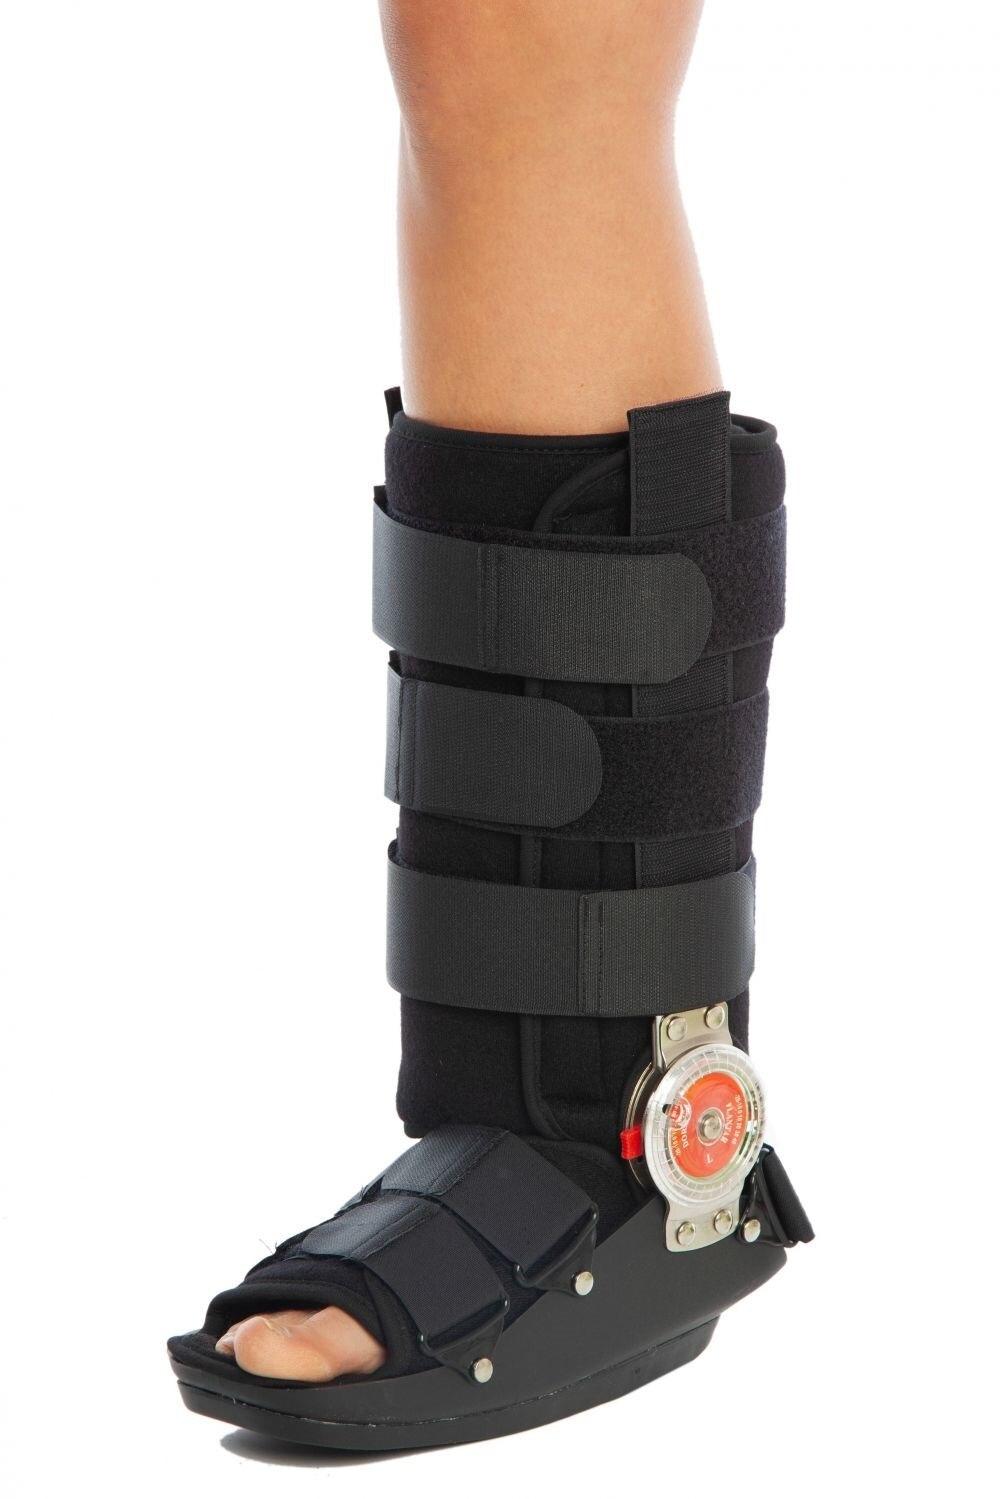 Achilles Tendon Boots Rom Walker Rehabilitation Shoes Walker Broken Foot Fixed Walker Botları Achilles Tendonitis Surgery